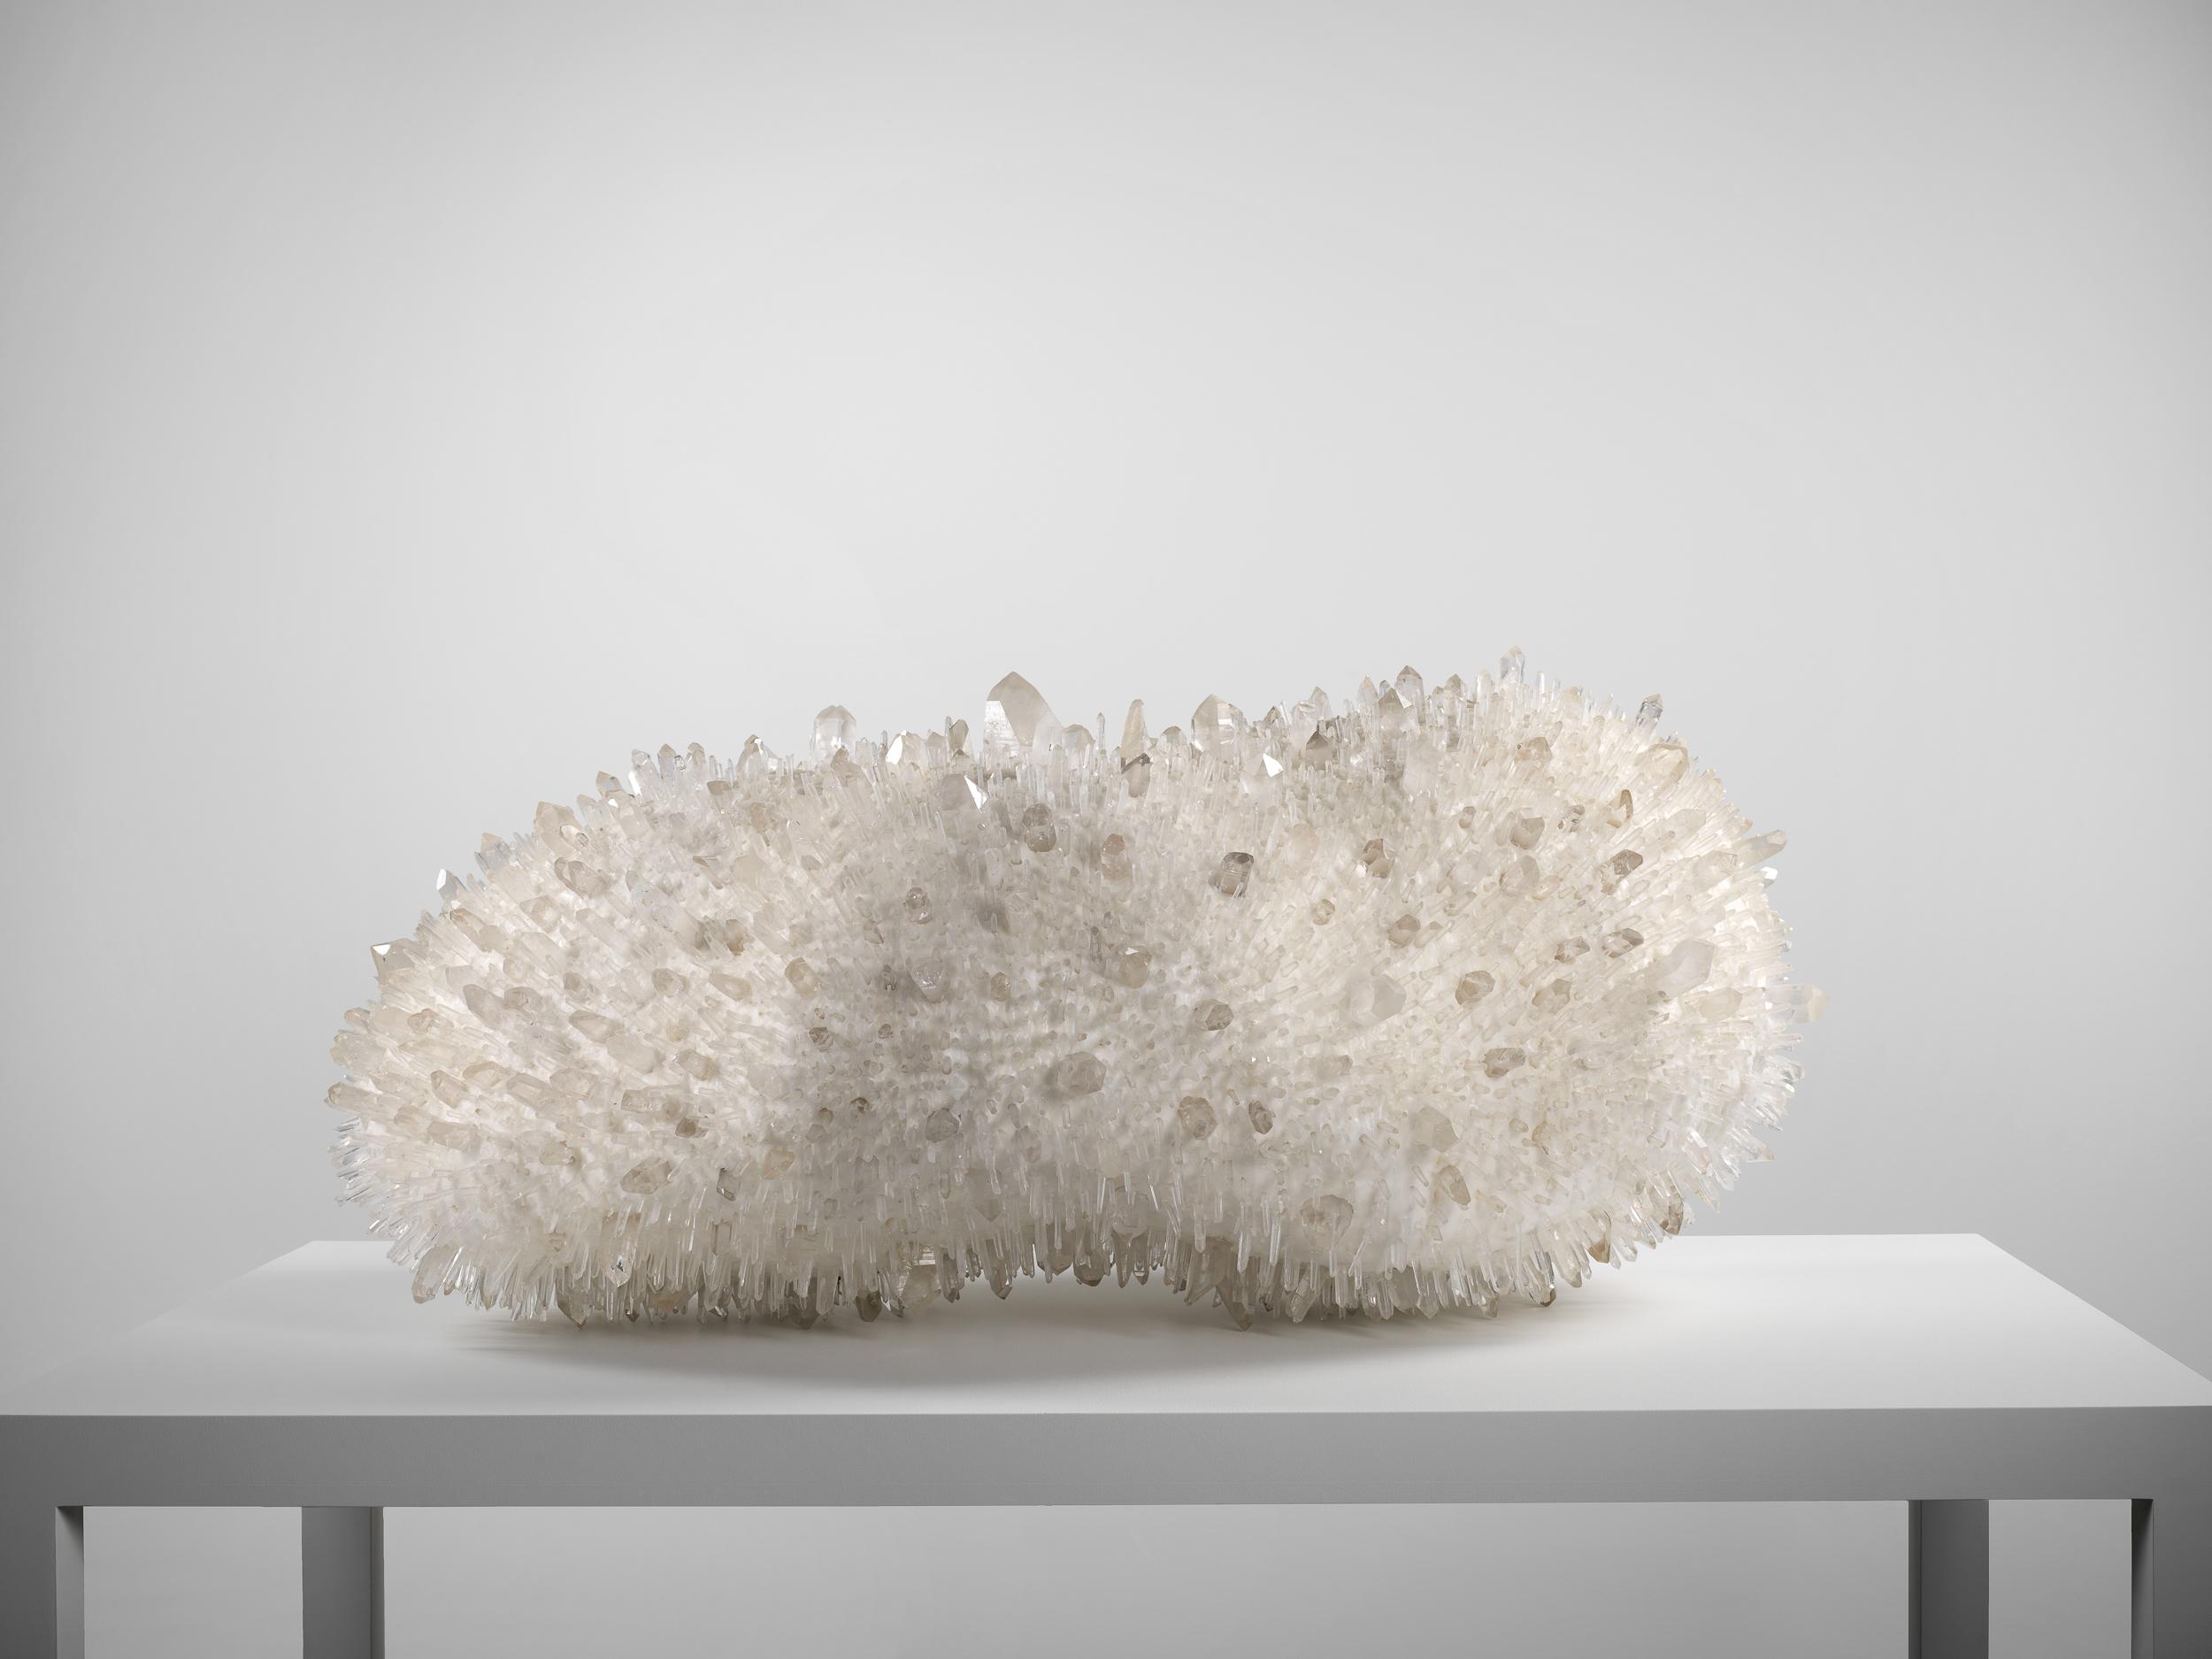 Sans titre (Untitled) 2000  Hubert Duprat (Born 1957, Nérac, France; lives and works in southern France) Paraffin wax and quartz crystals